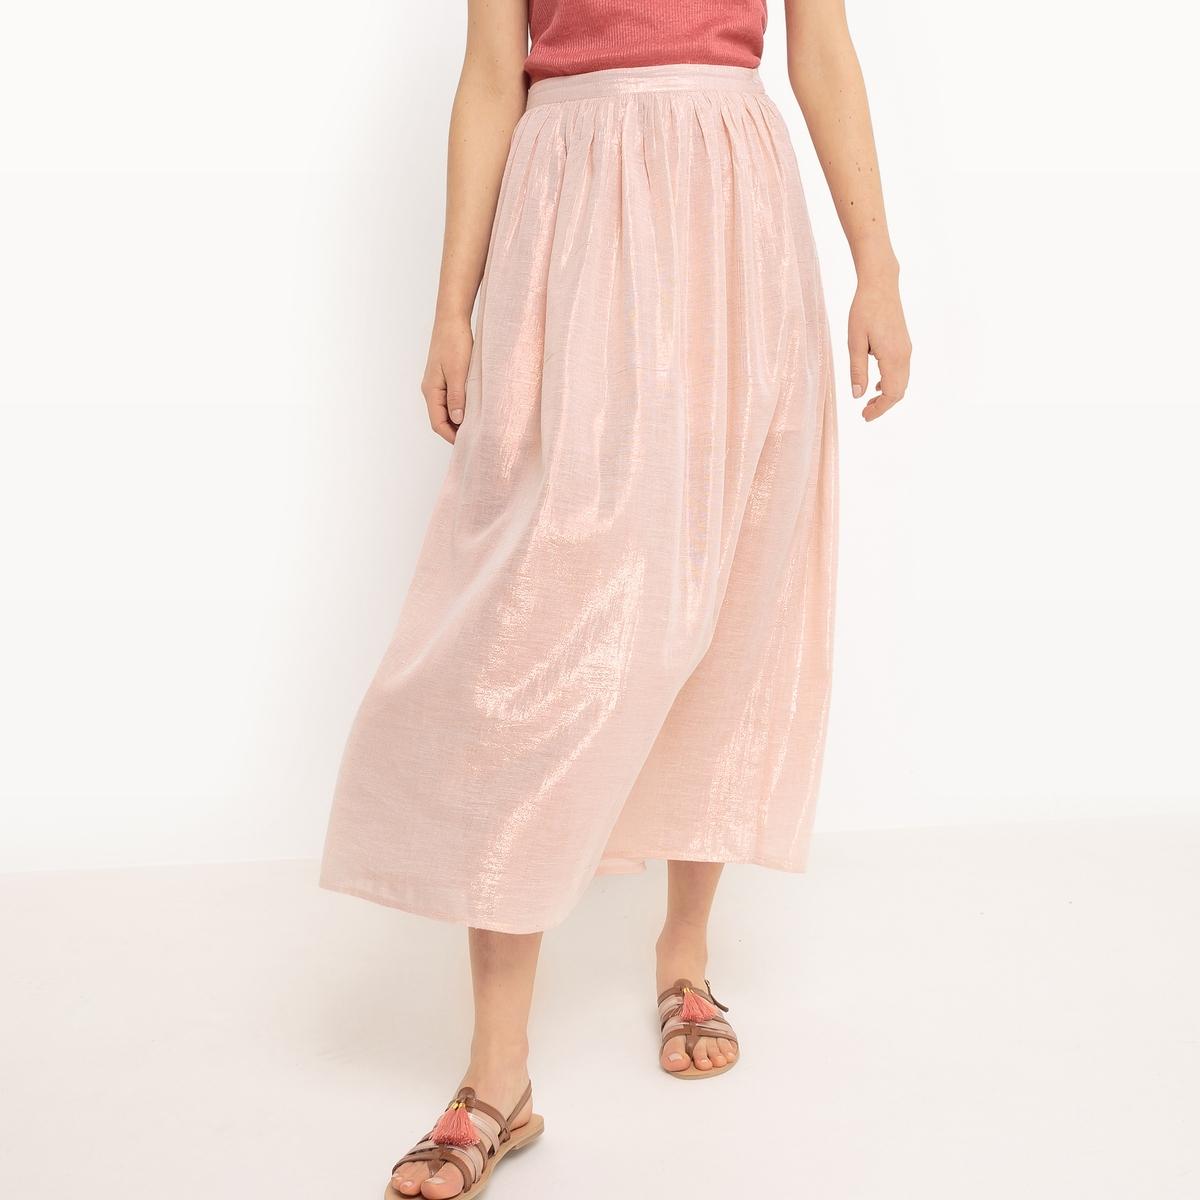 Юбка-миди в полоску розового цвета